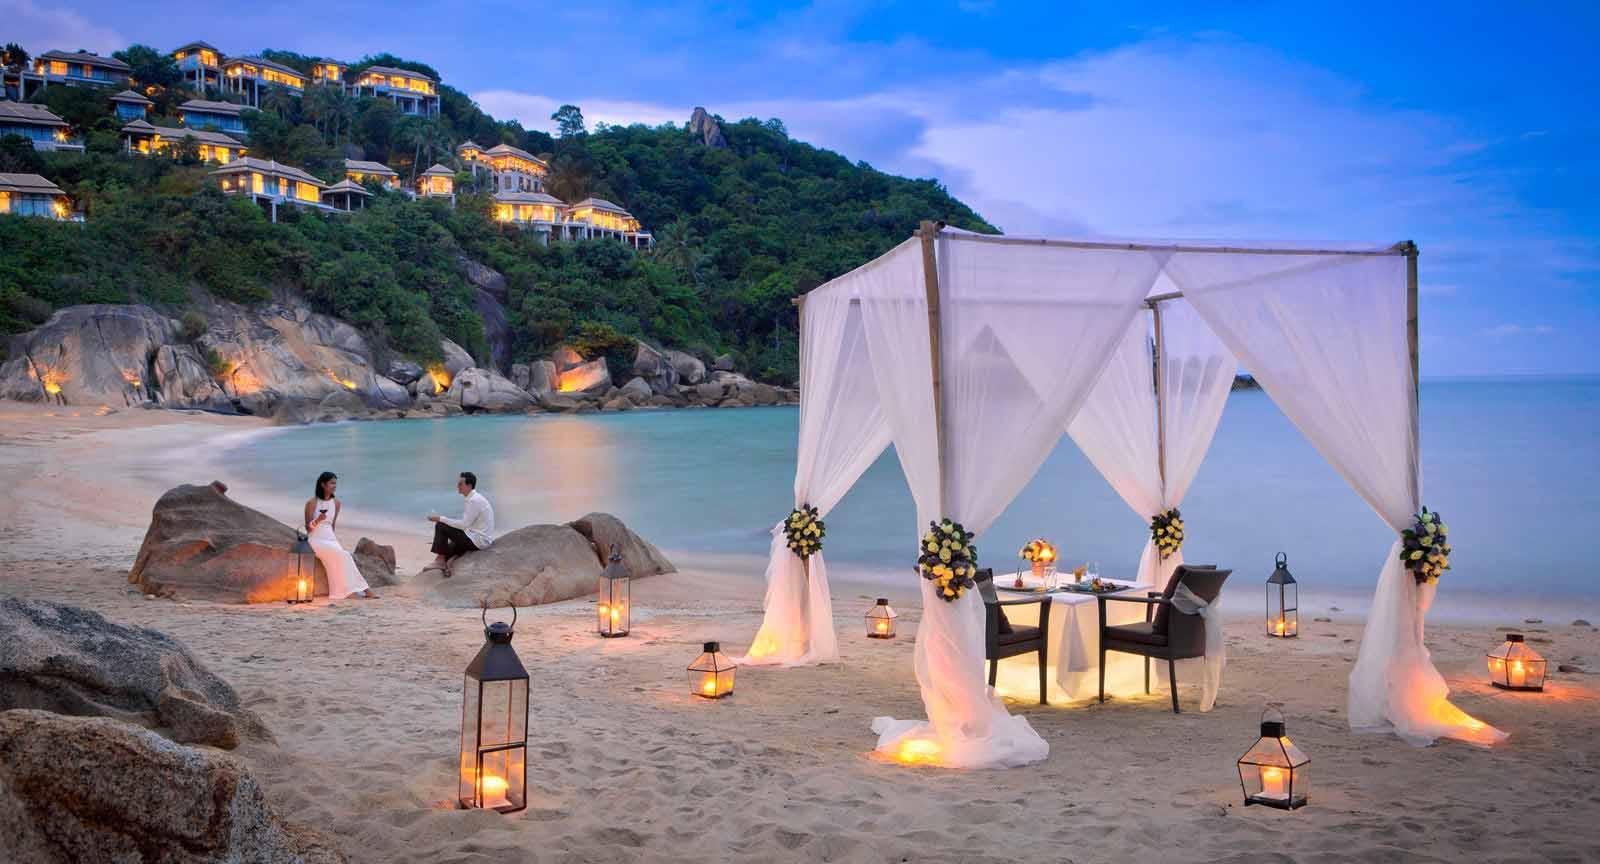 Top 10 Best Romantic International Honeymoon Destinations